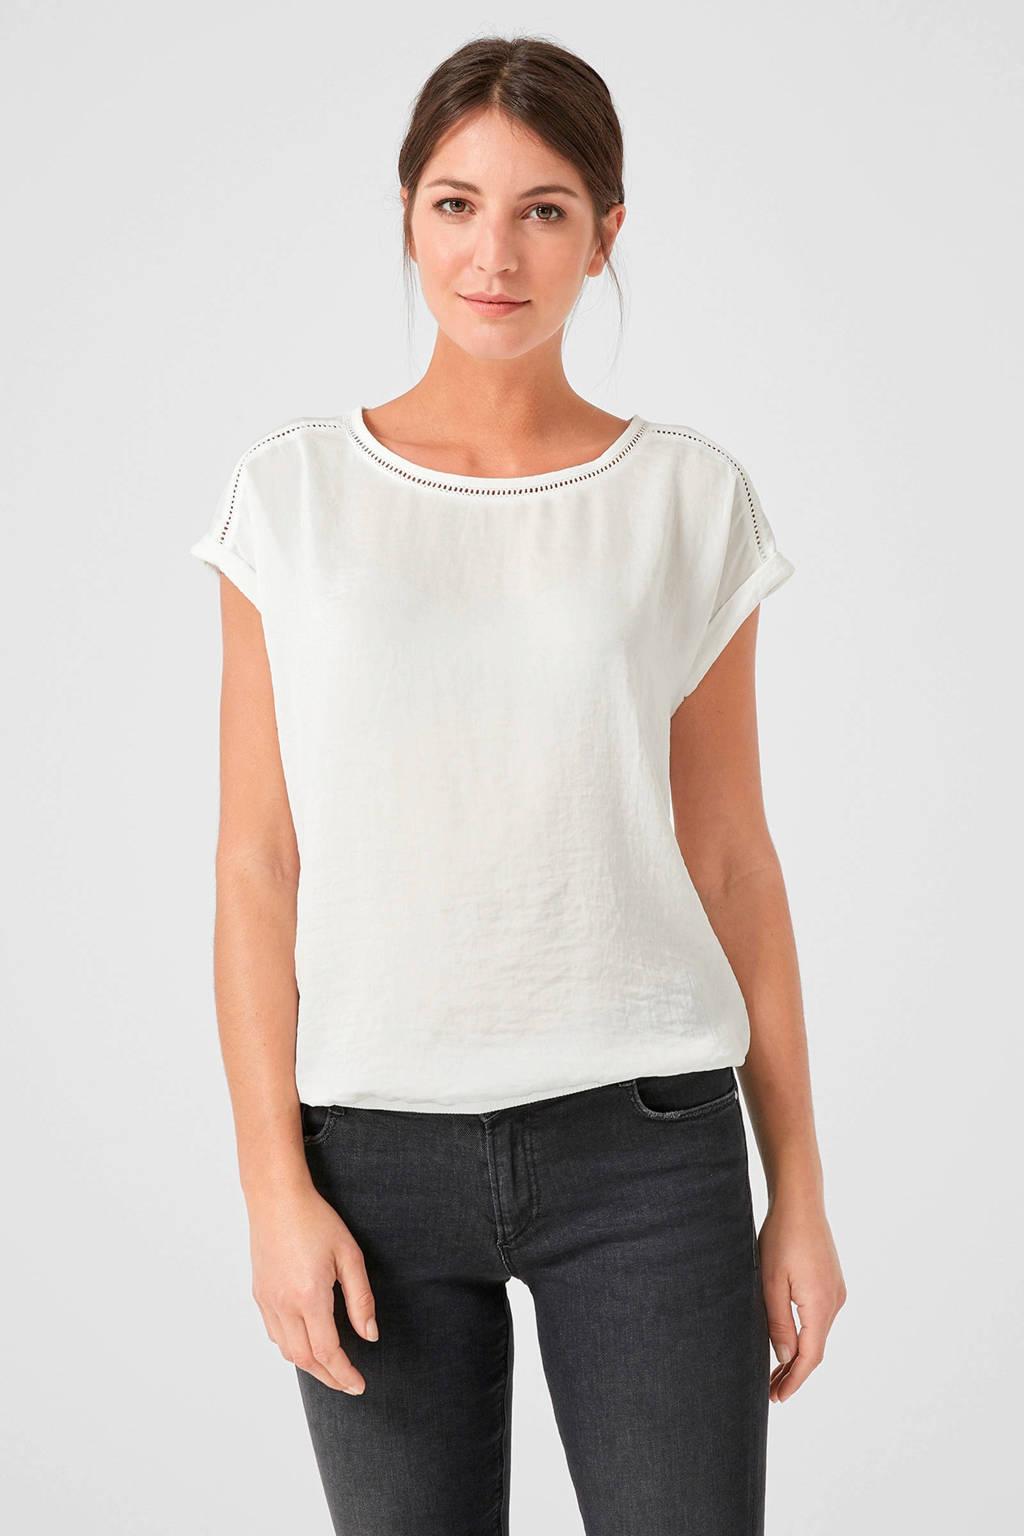 S Ecru S shirt S shirt Ecru olivert olivert olivert shirt FTqBW1c1